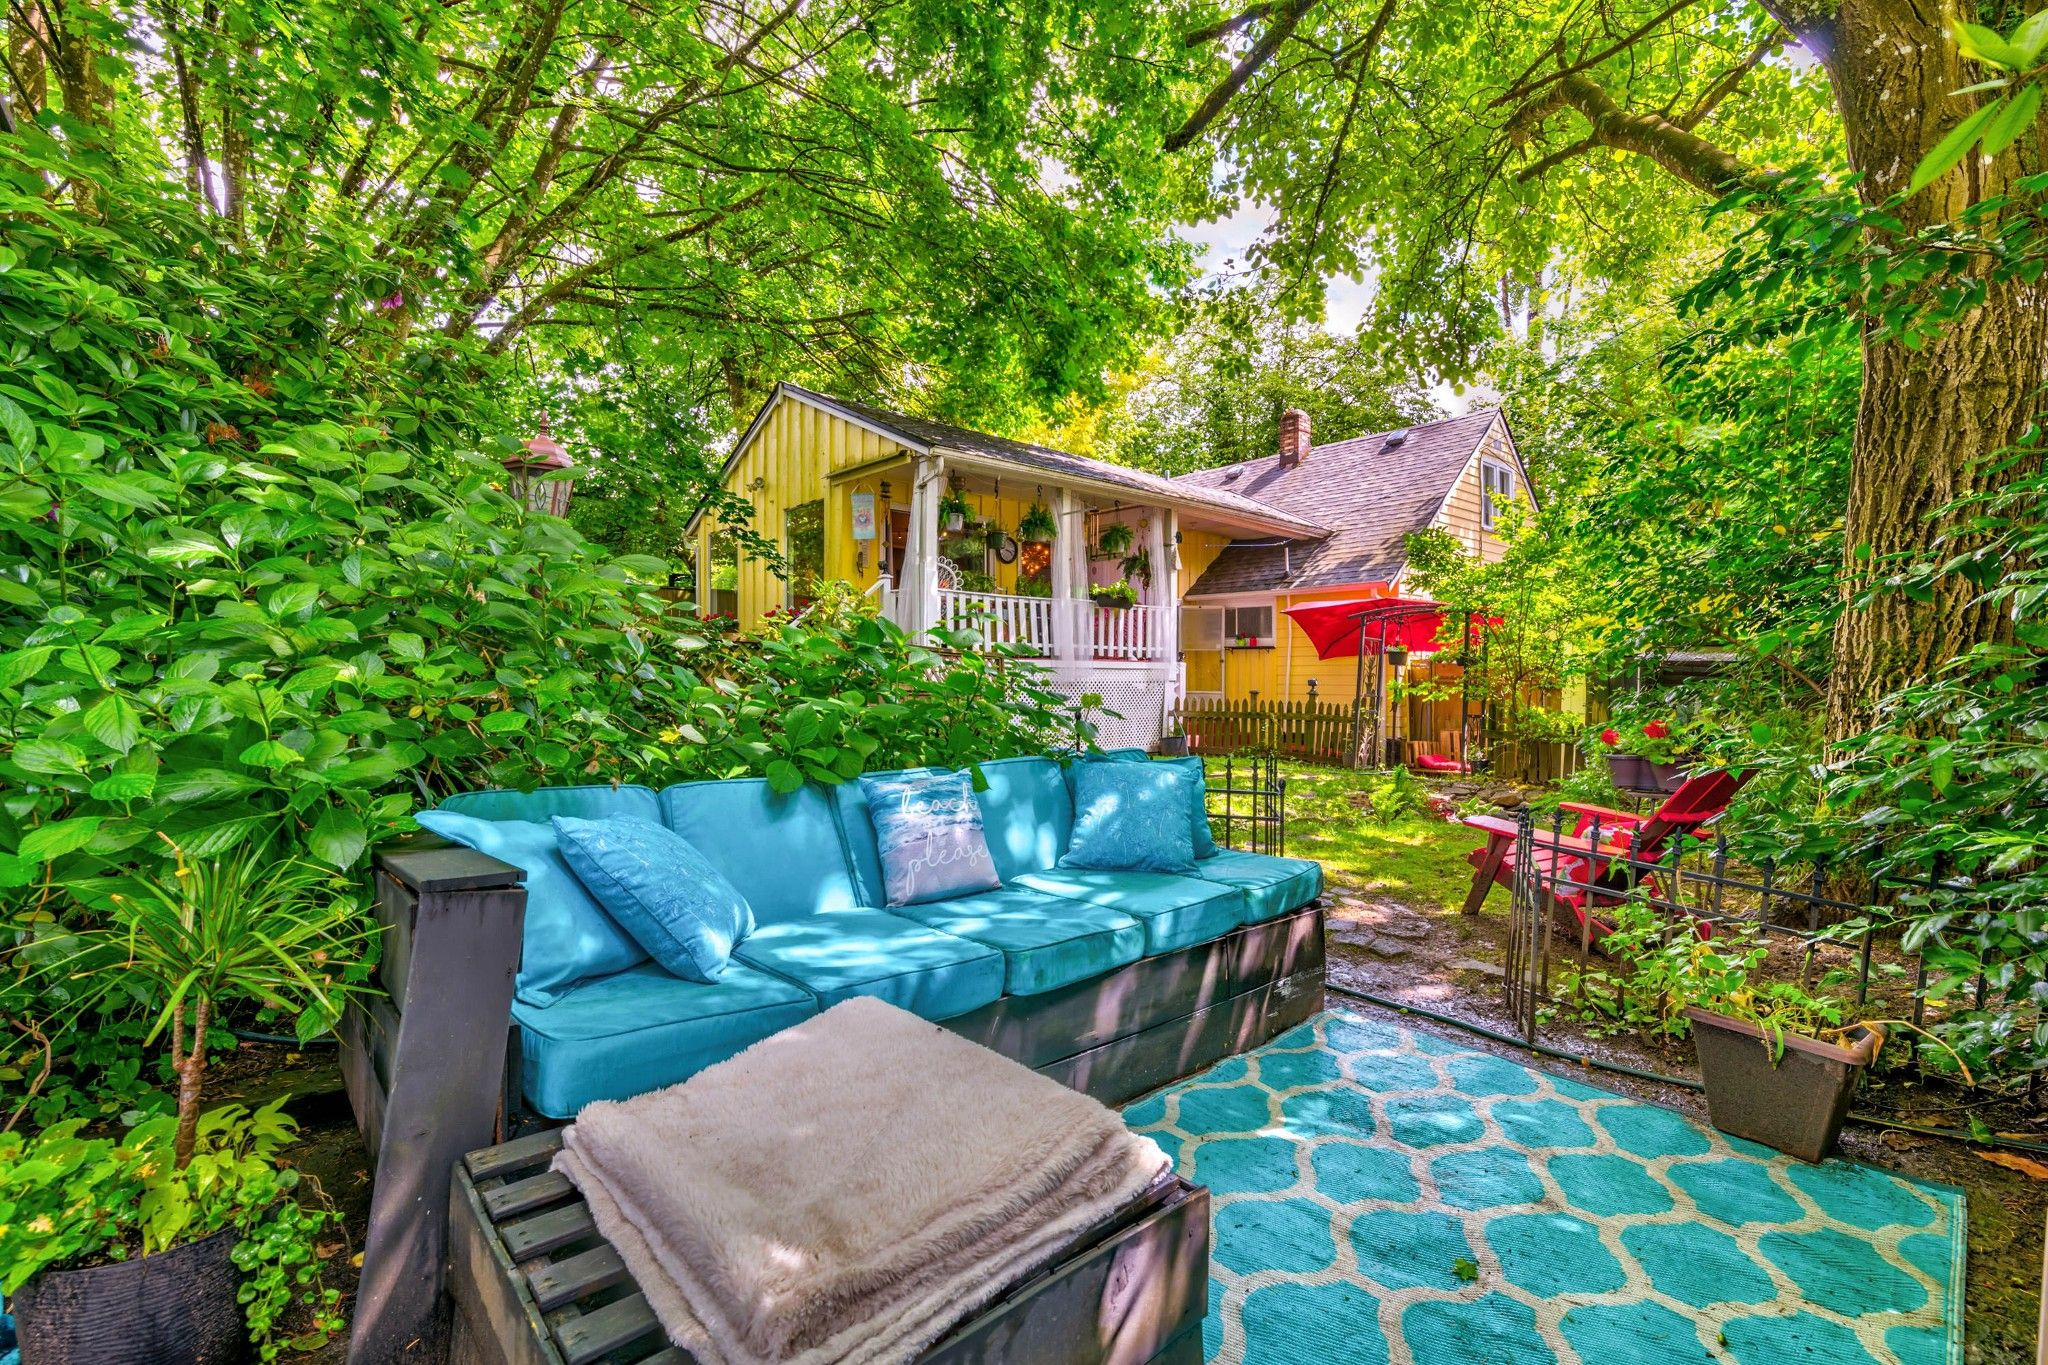 Photo 26: Photos: 20623 114 Avenue in Maple Ridge: Southwest Maple Ridge House for sale : MLS®# R2465656